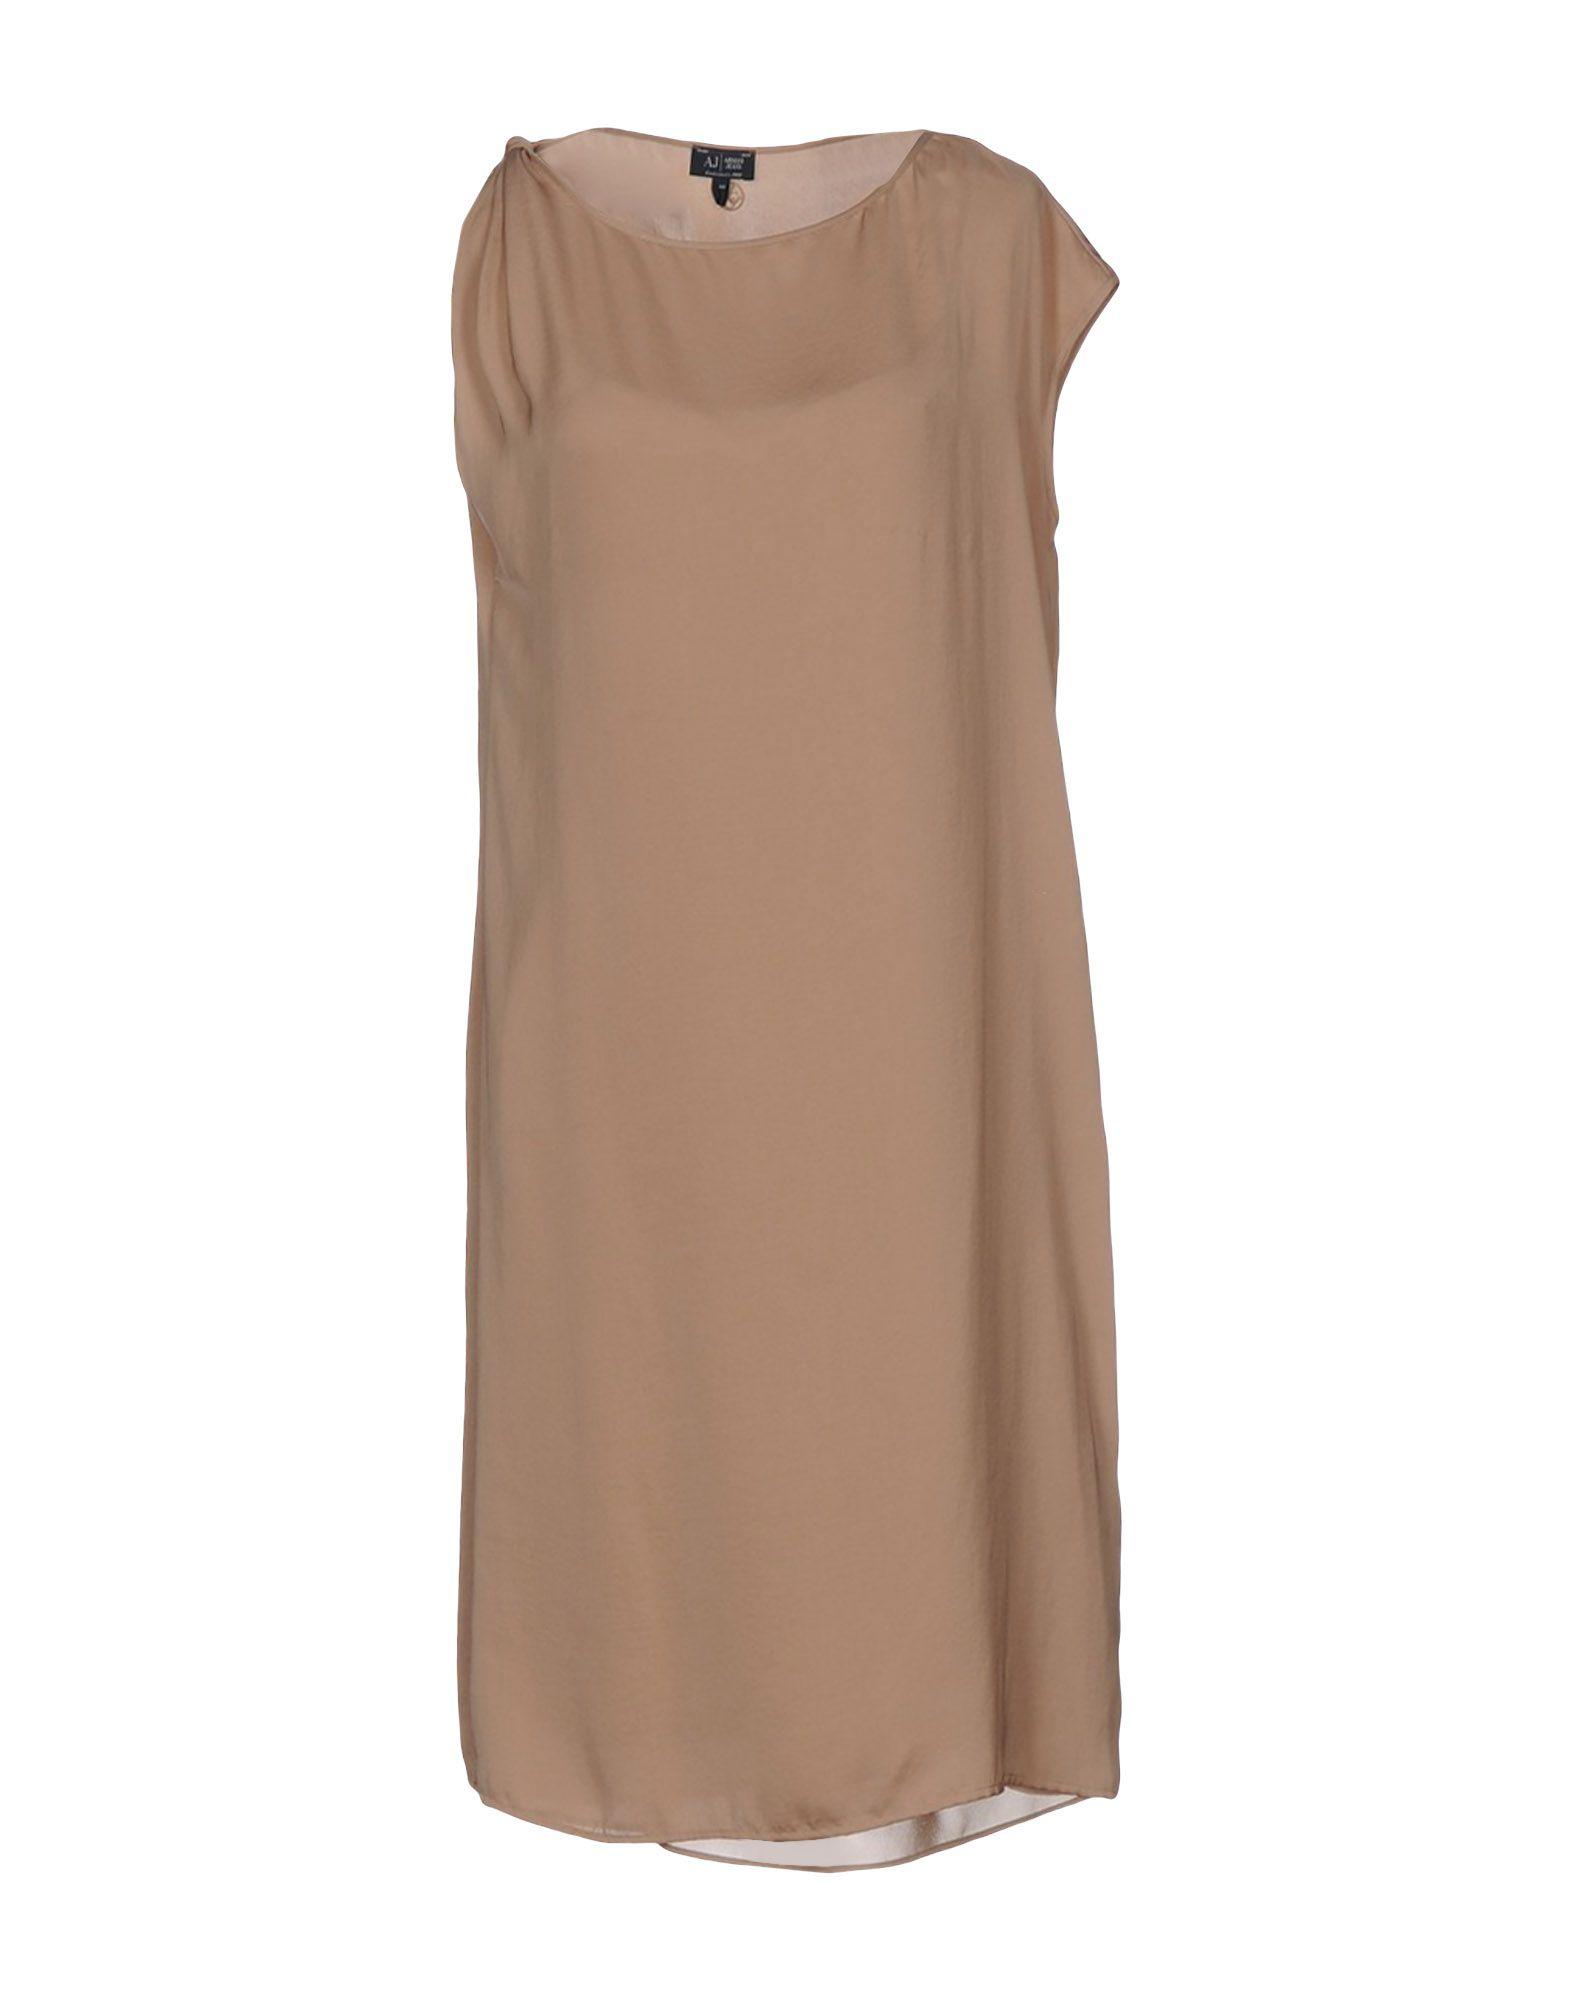 ARMANI JEANS Платье до колена платье armani jeans 6y5a11 5n2bz 1200